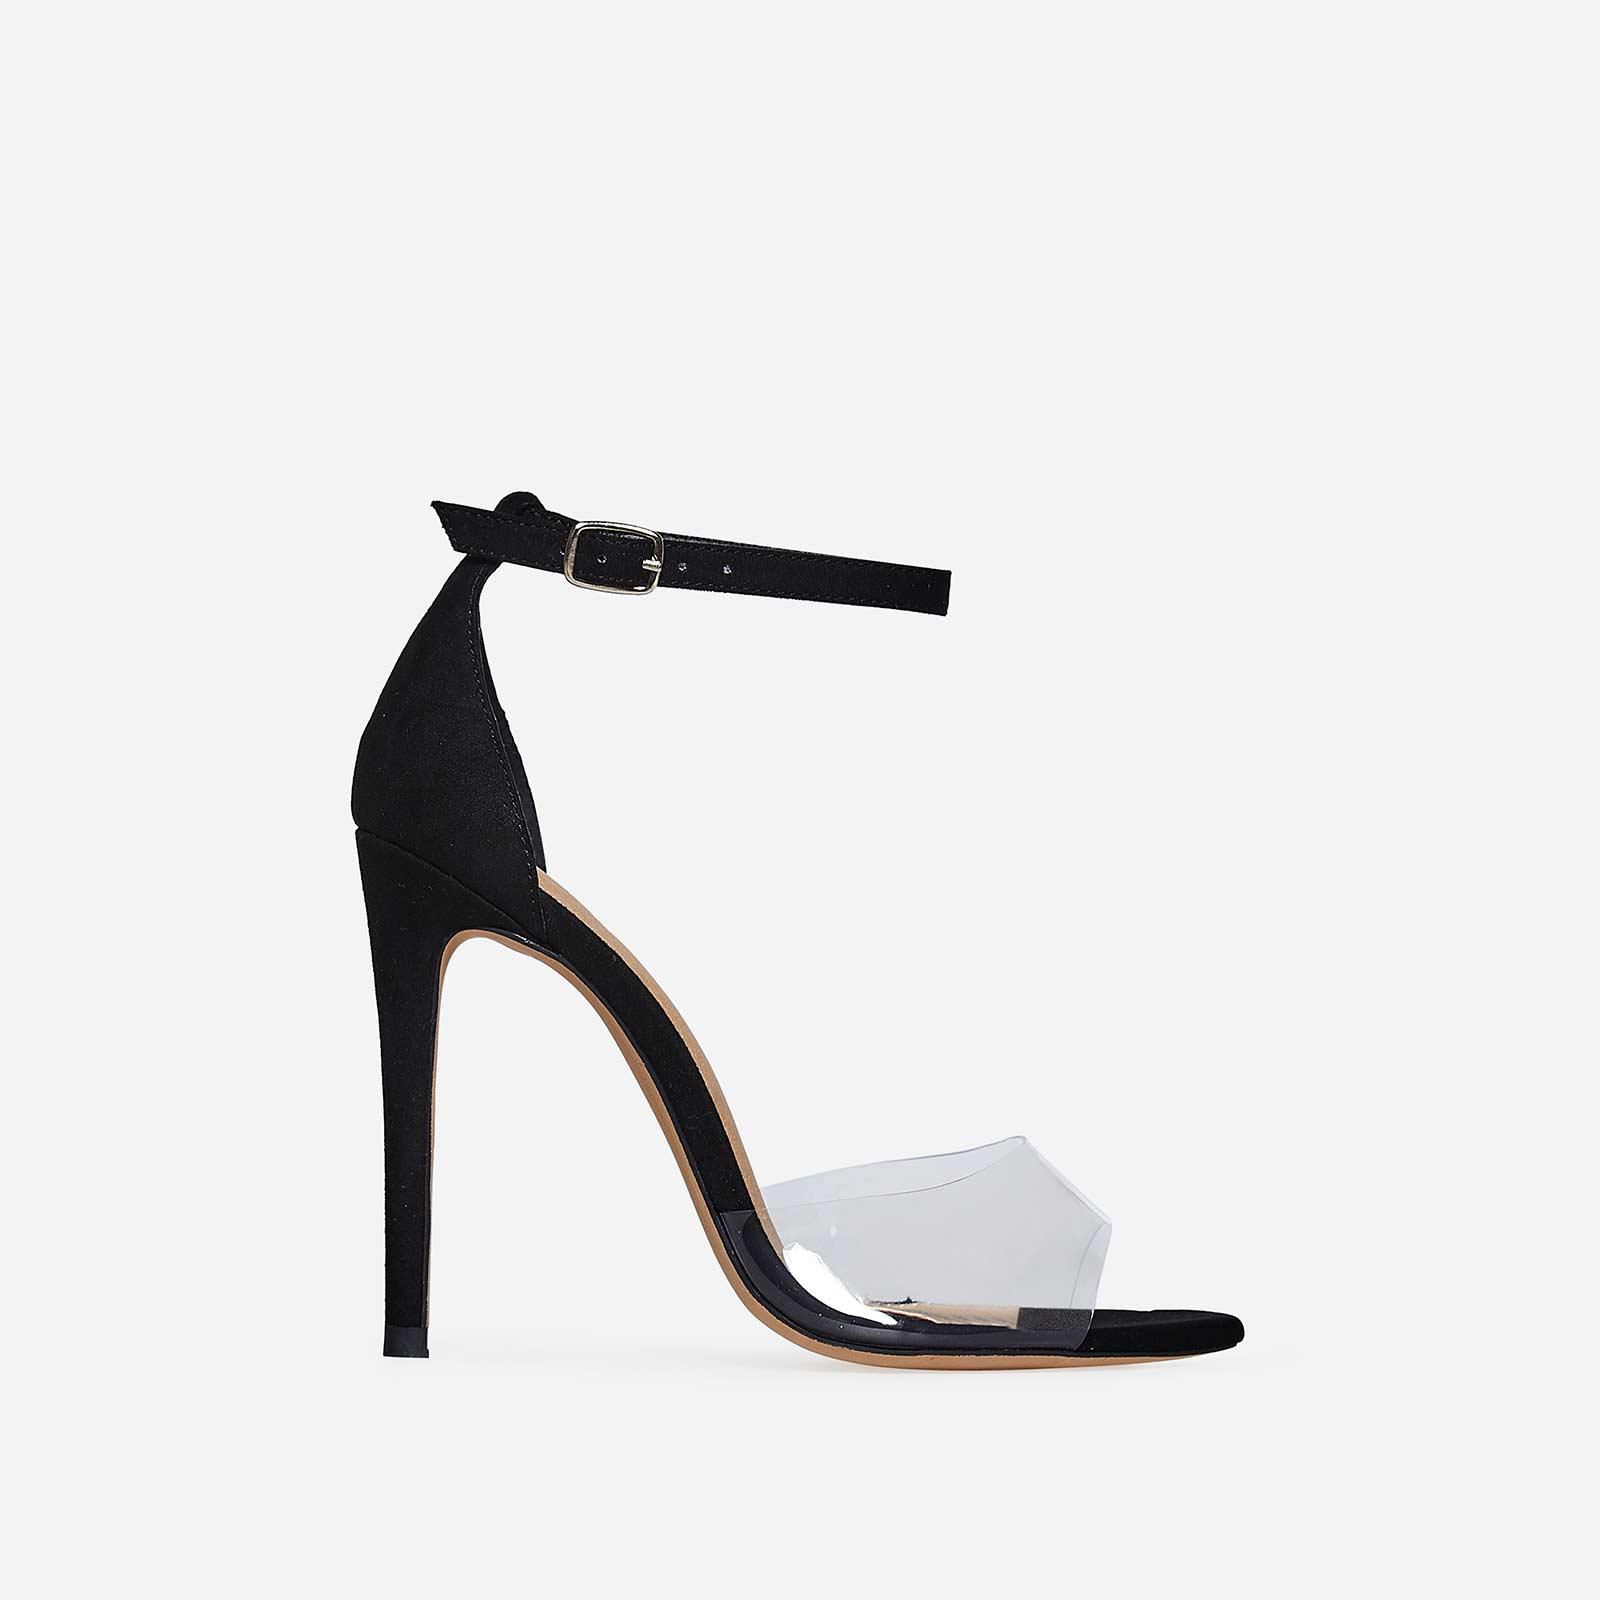 Gabi Peep Toe Perspex Heel In Black Patent